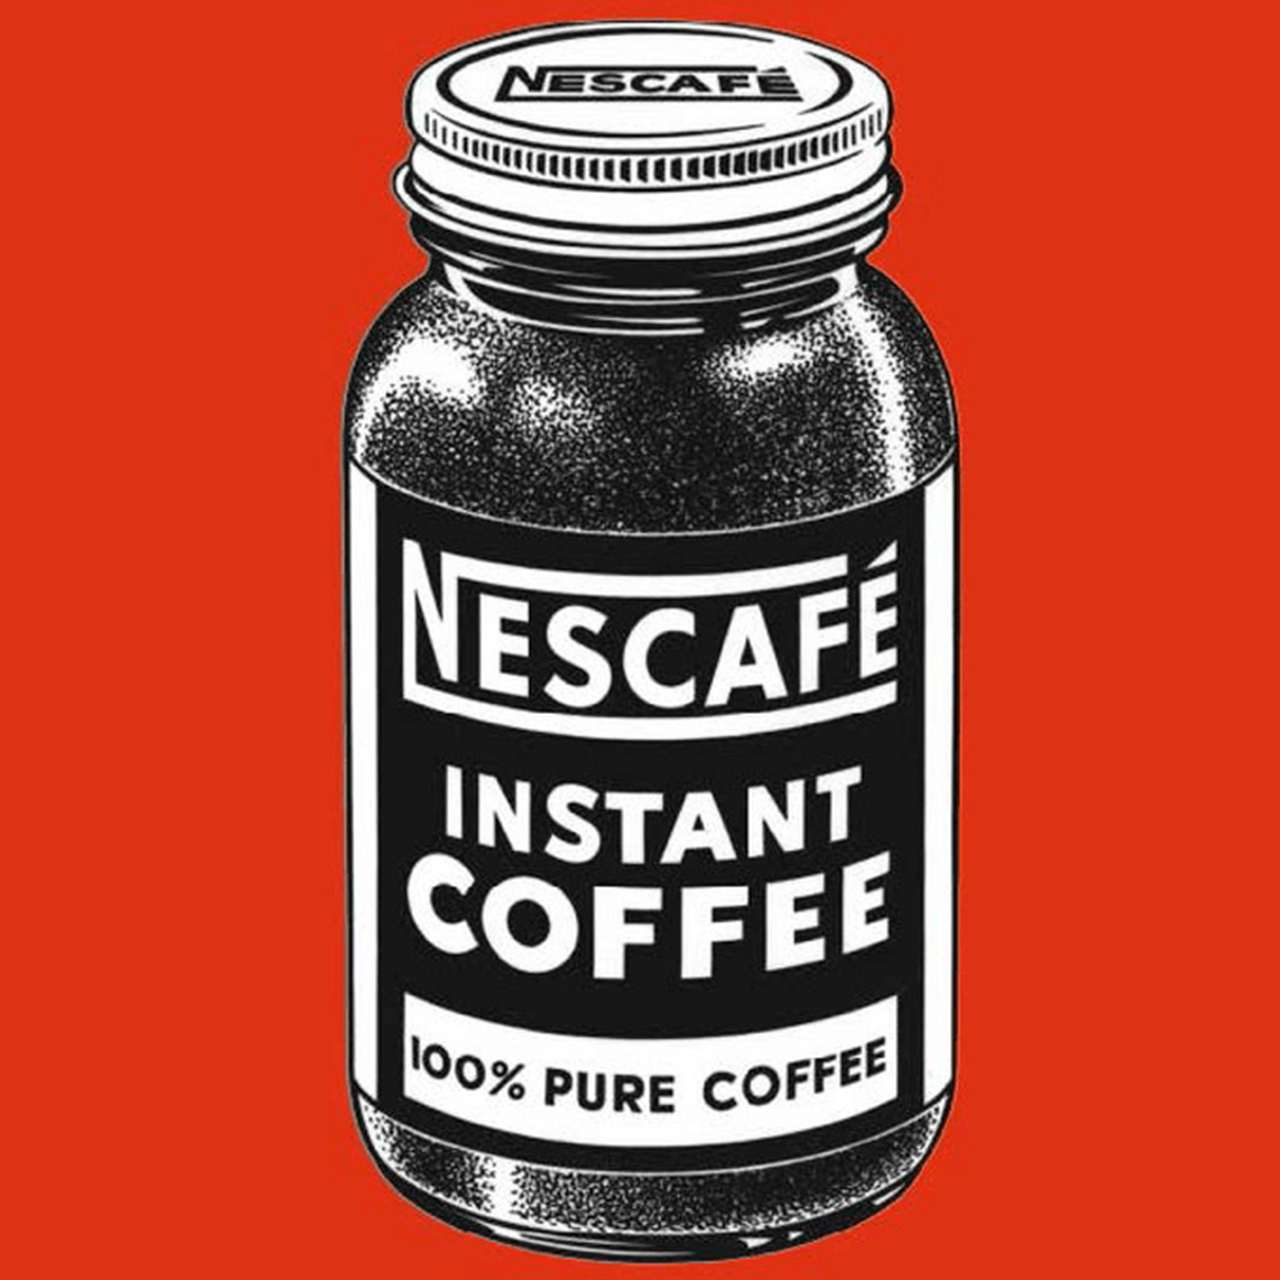 First coffee jar